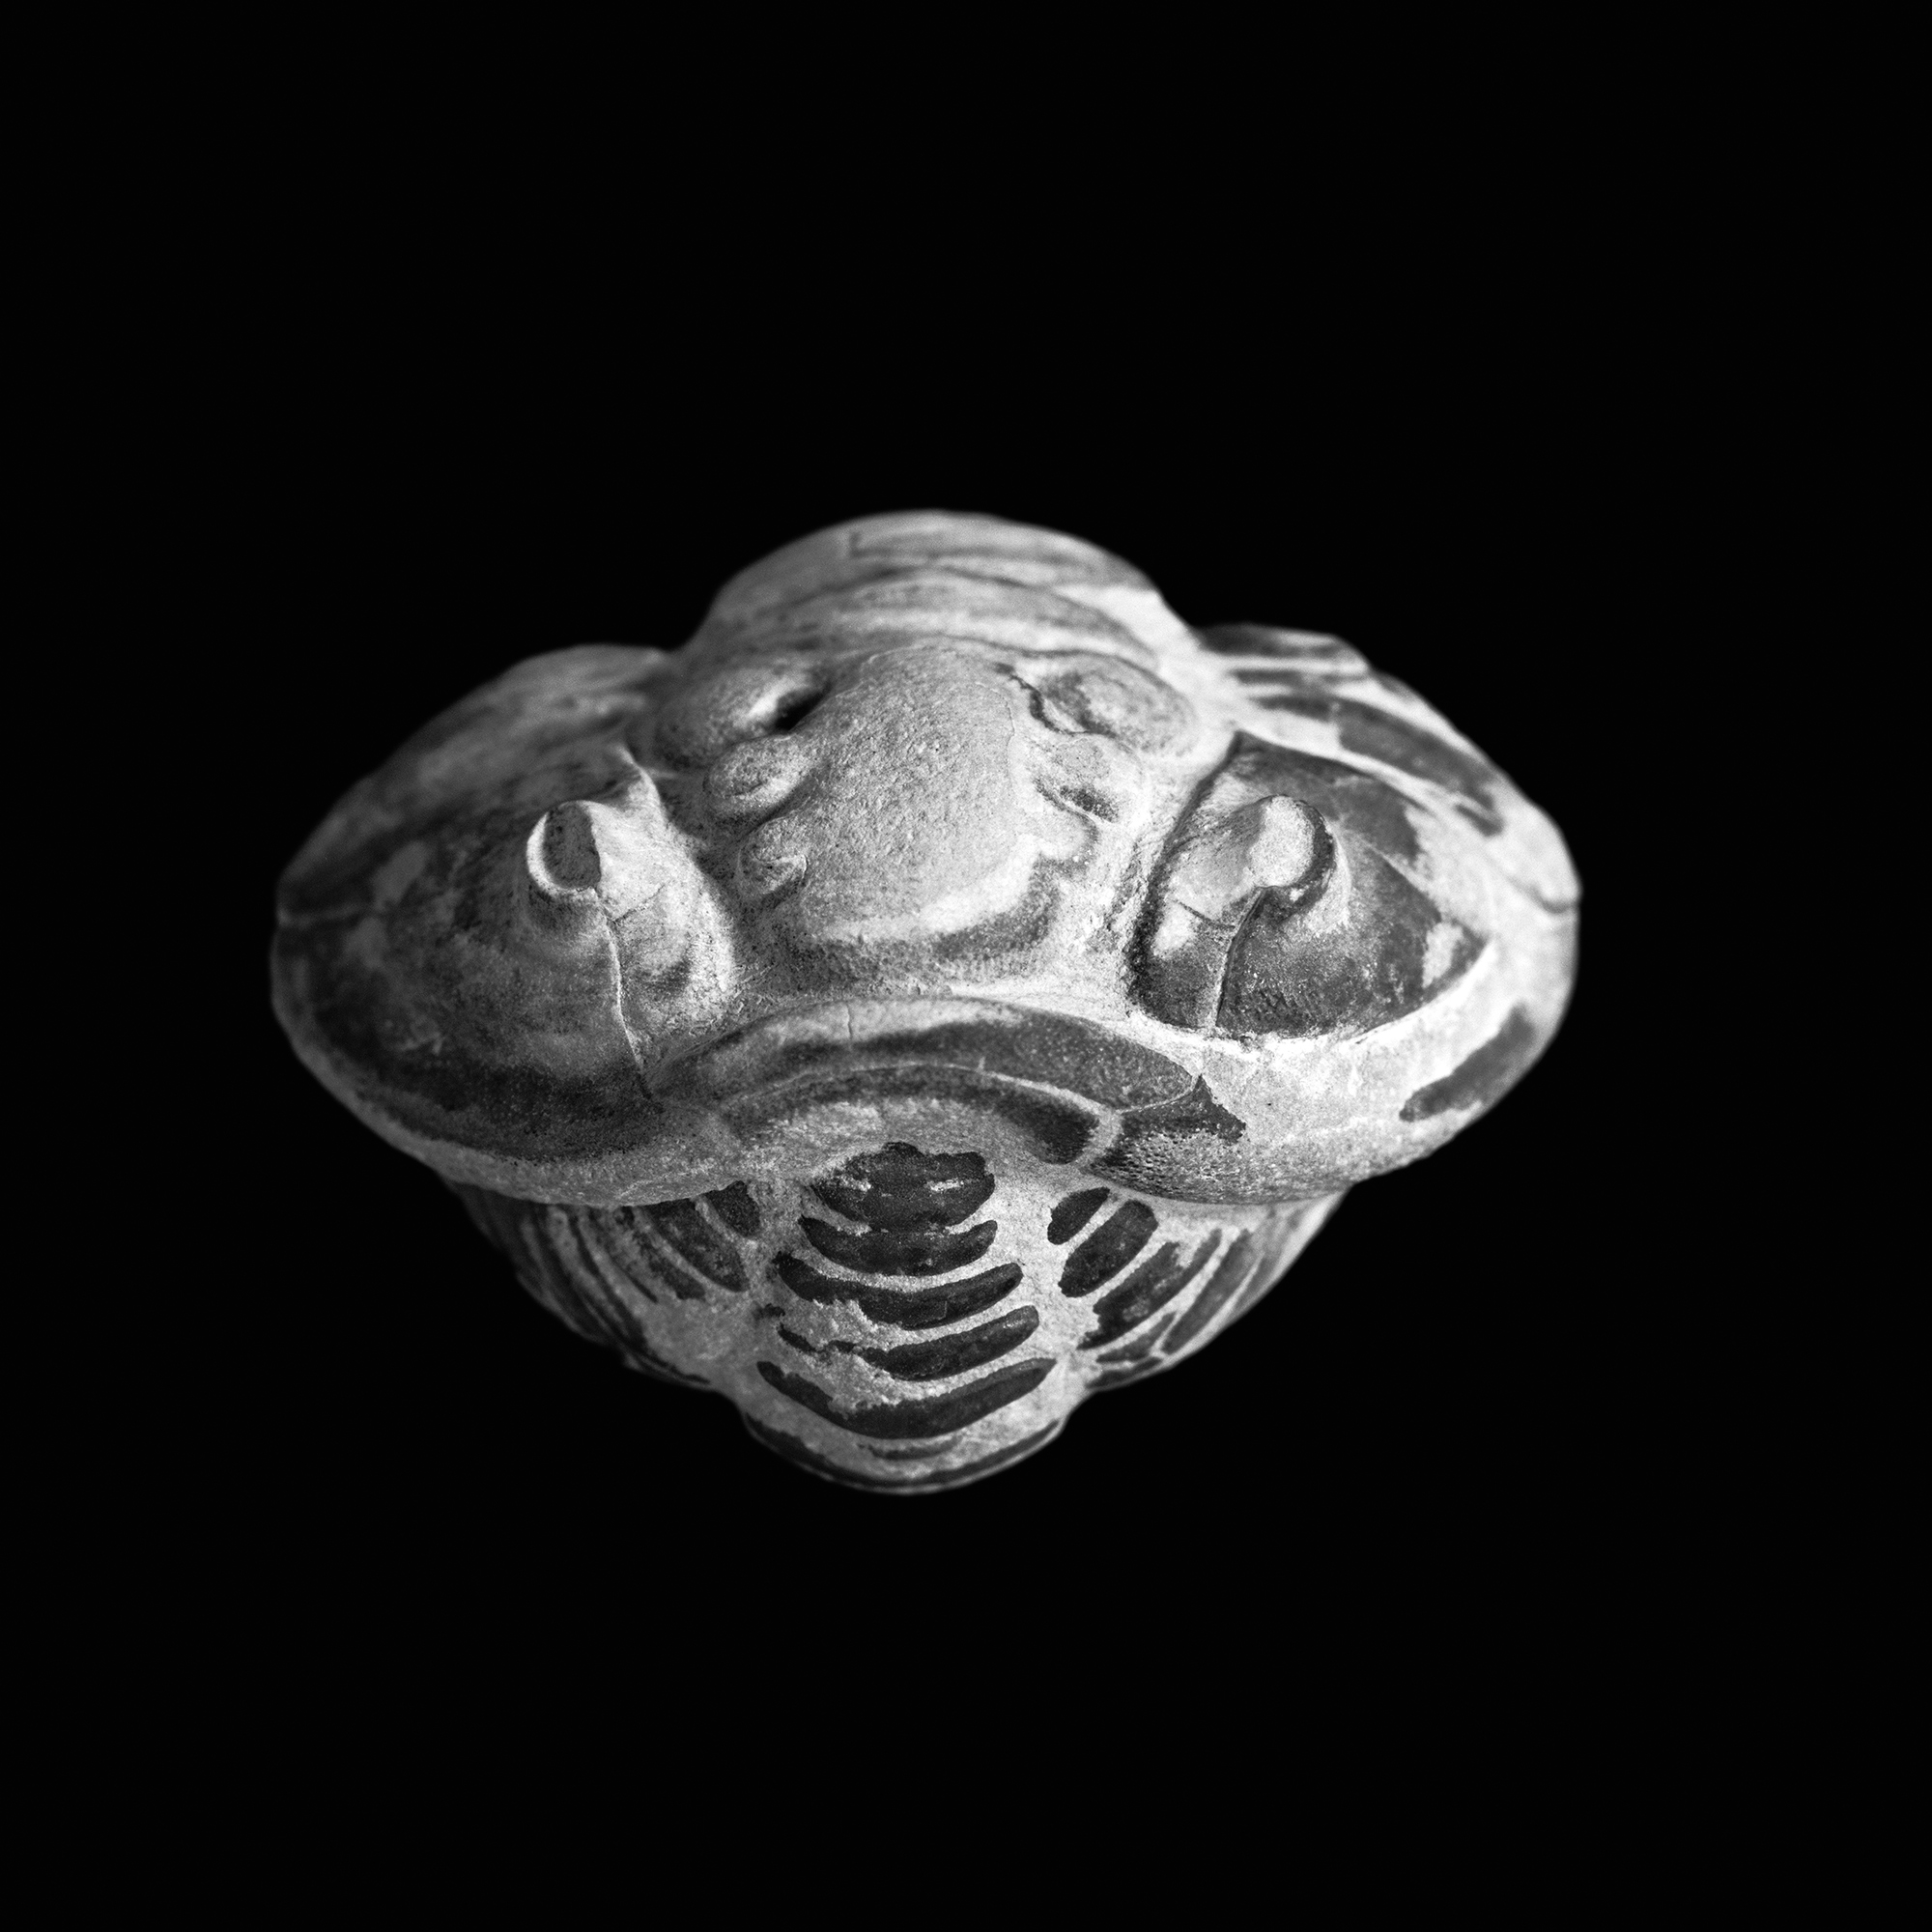 Flexicalymene meeki, Foerste, Oberes Ordovizium, Ohio, U.S.A